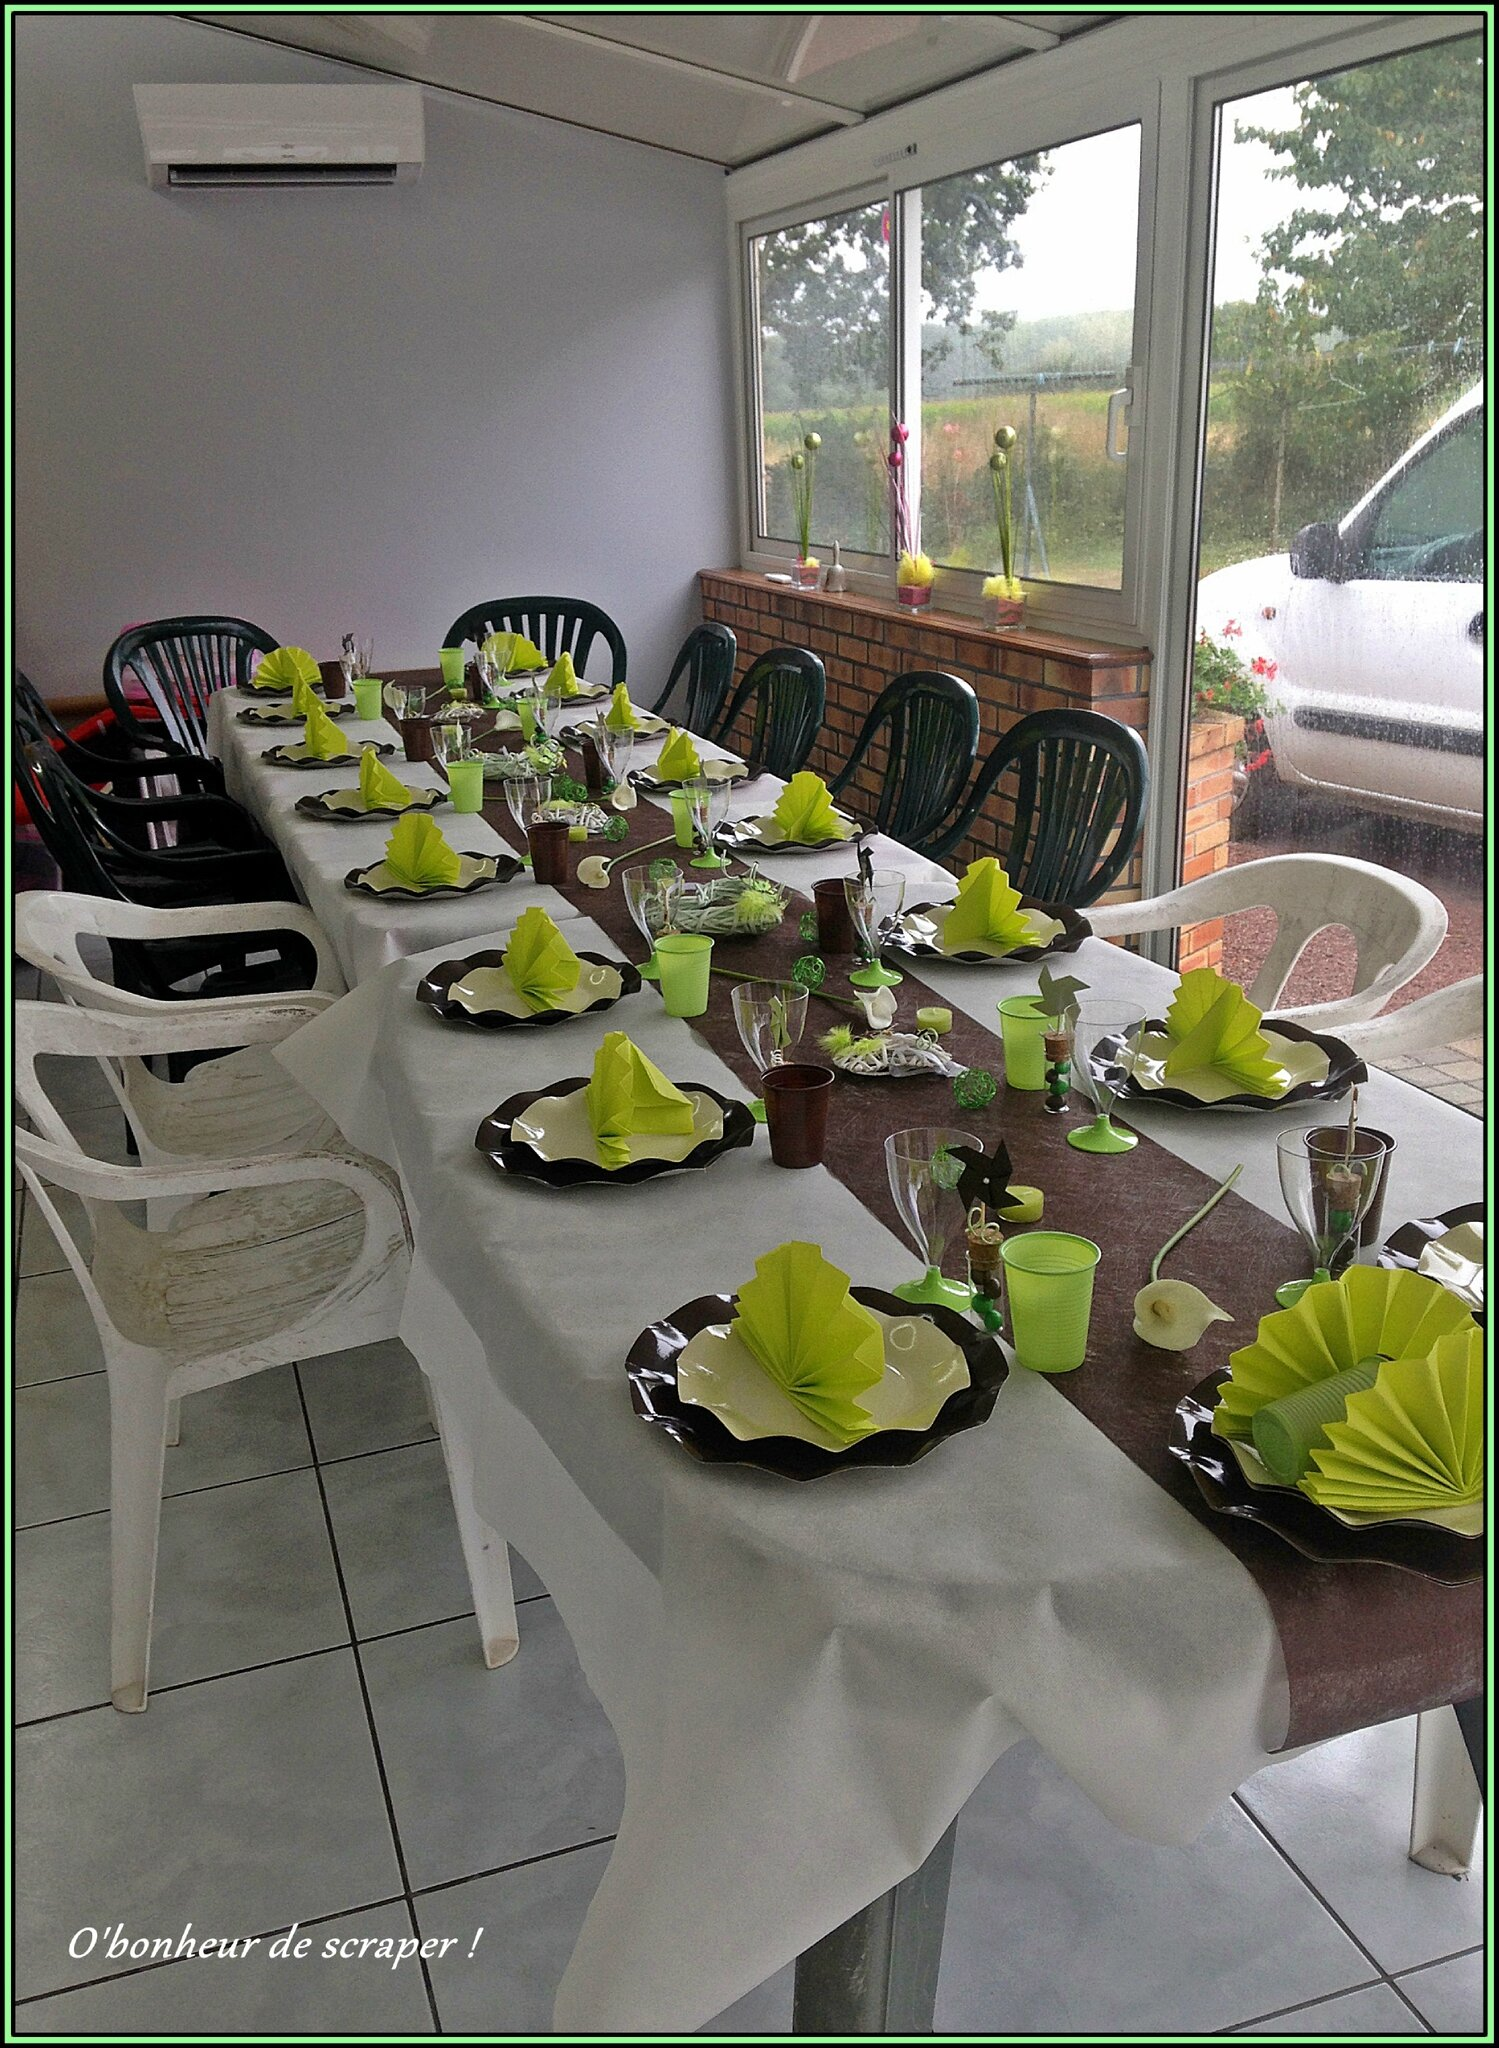 D coration de table th me nature o 39 bonheur de scraper - Deco de table theme nature ...